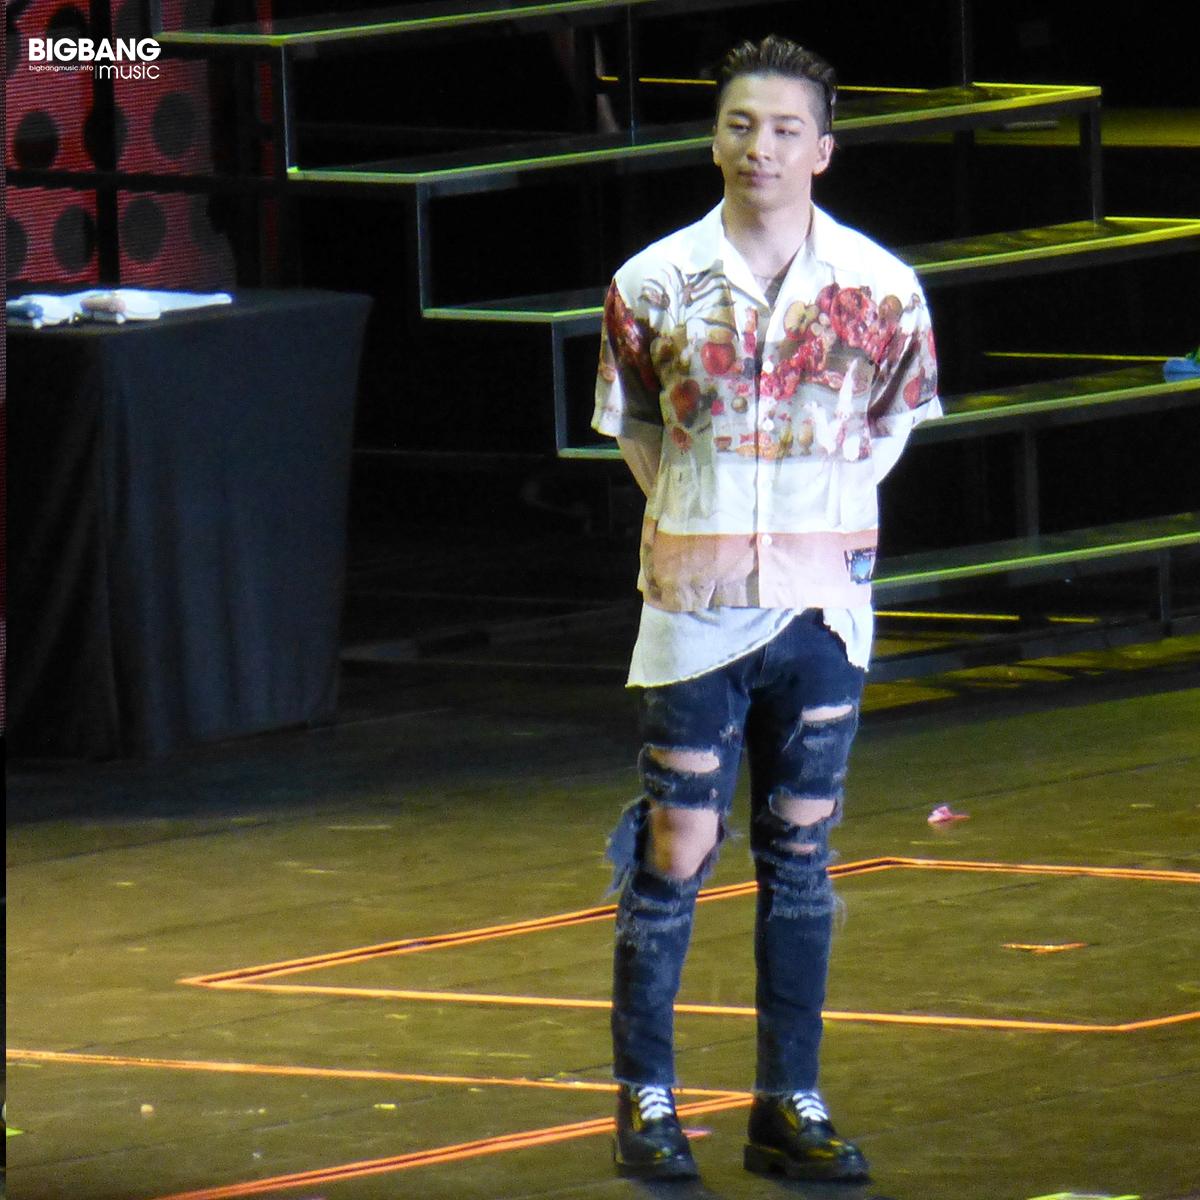 BIGBANGmusic-BIGBANG-FM-Hong-Kong-Day-2-2016-07-23-22